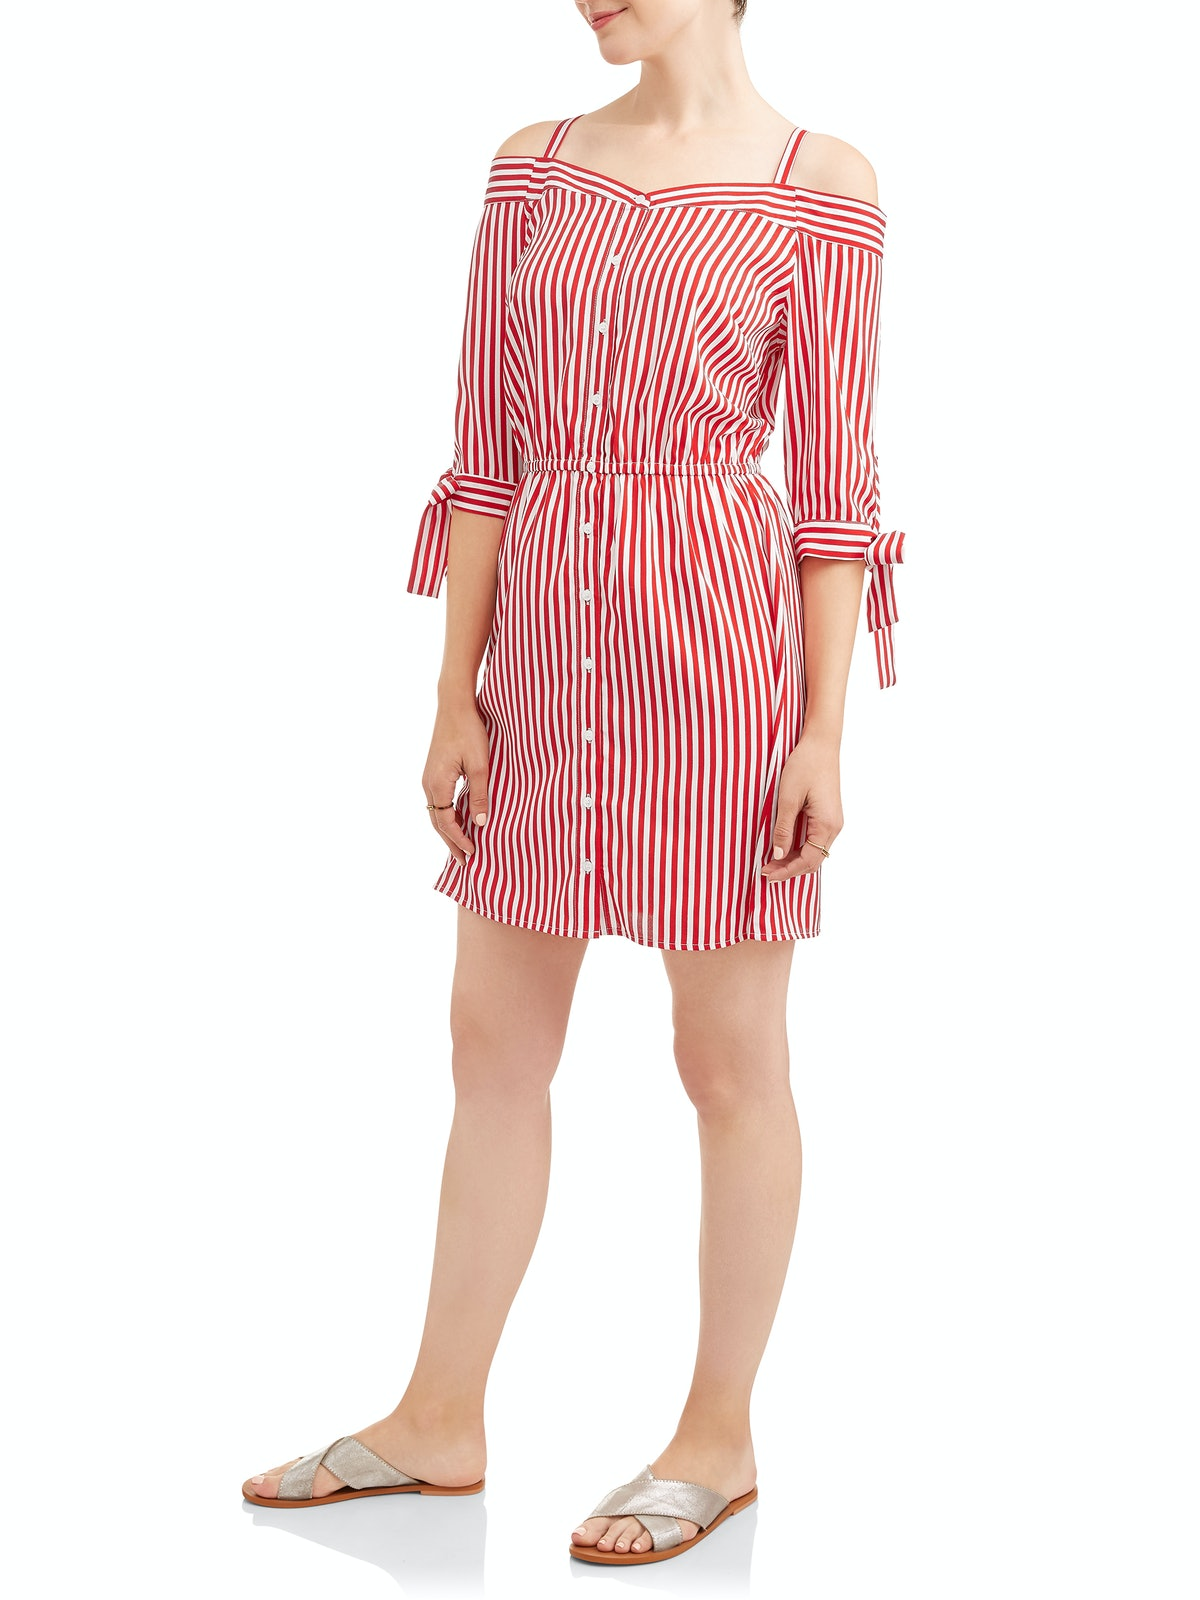 Millennium Women's Stripe Off The Shoulder Shirt Dress